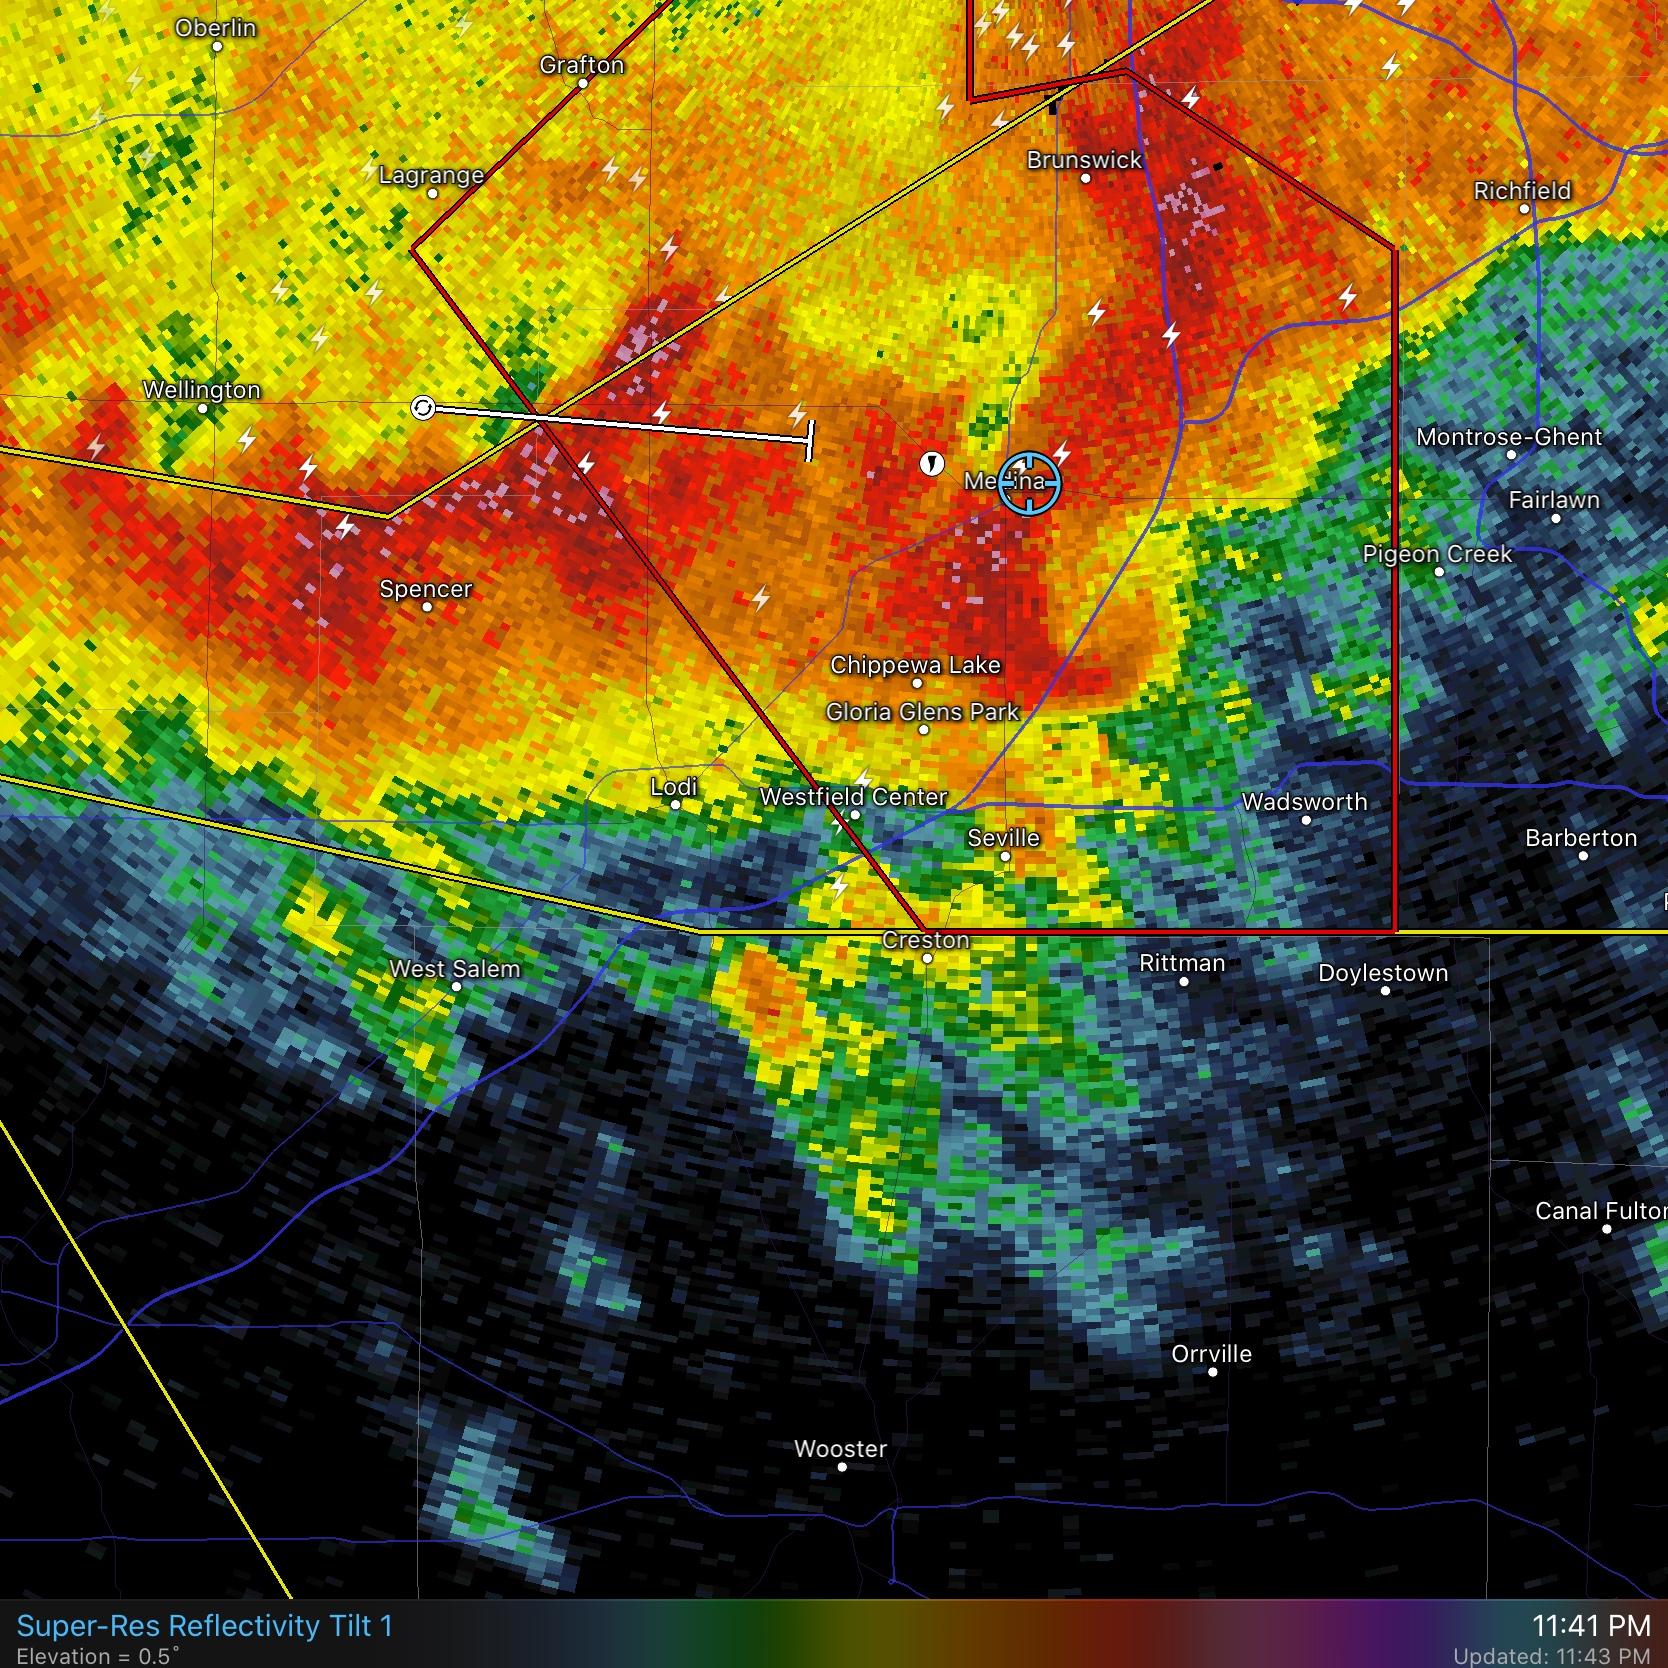 Radar image of severe thunderstorm with tornadic hook.